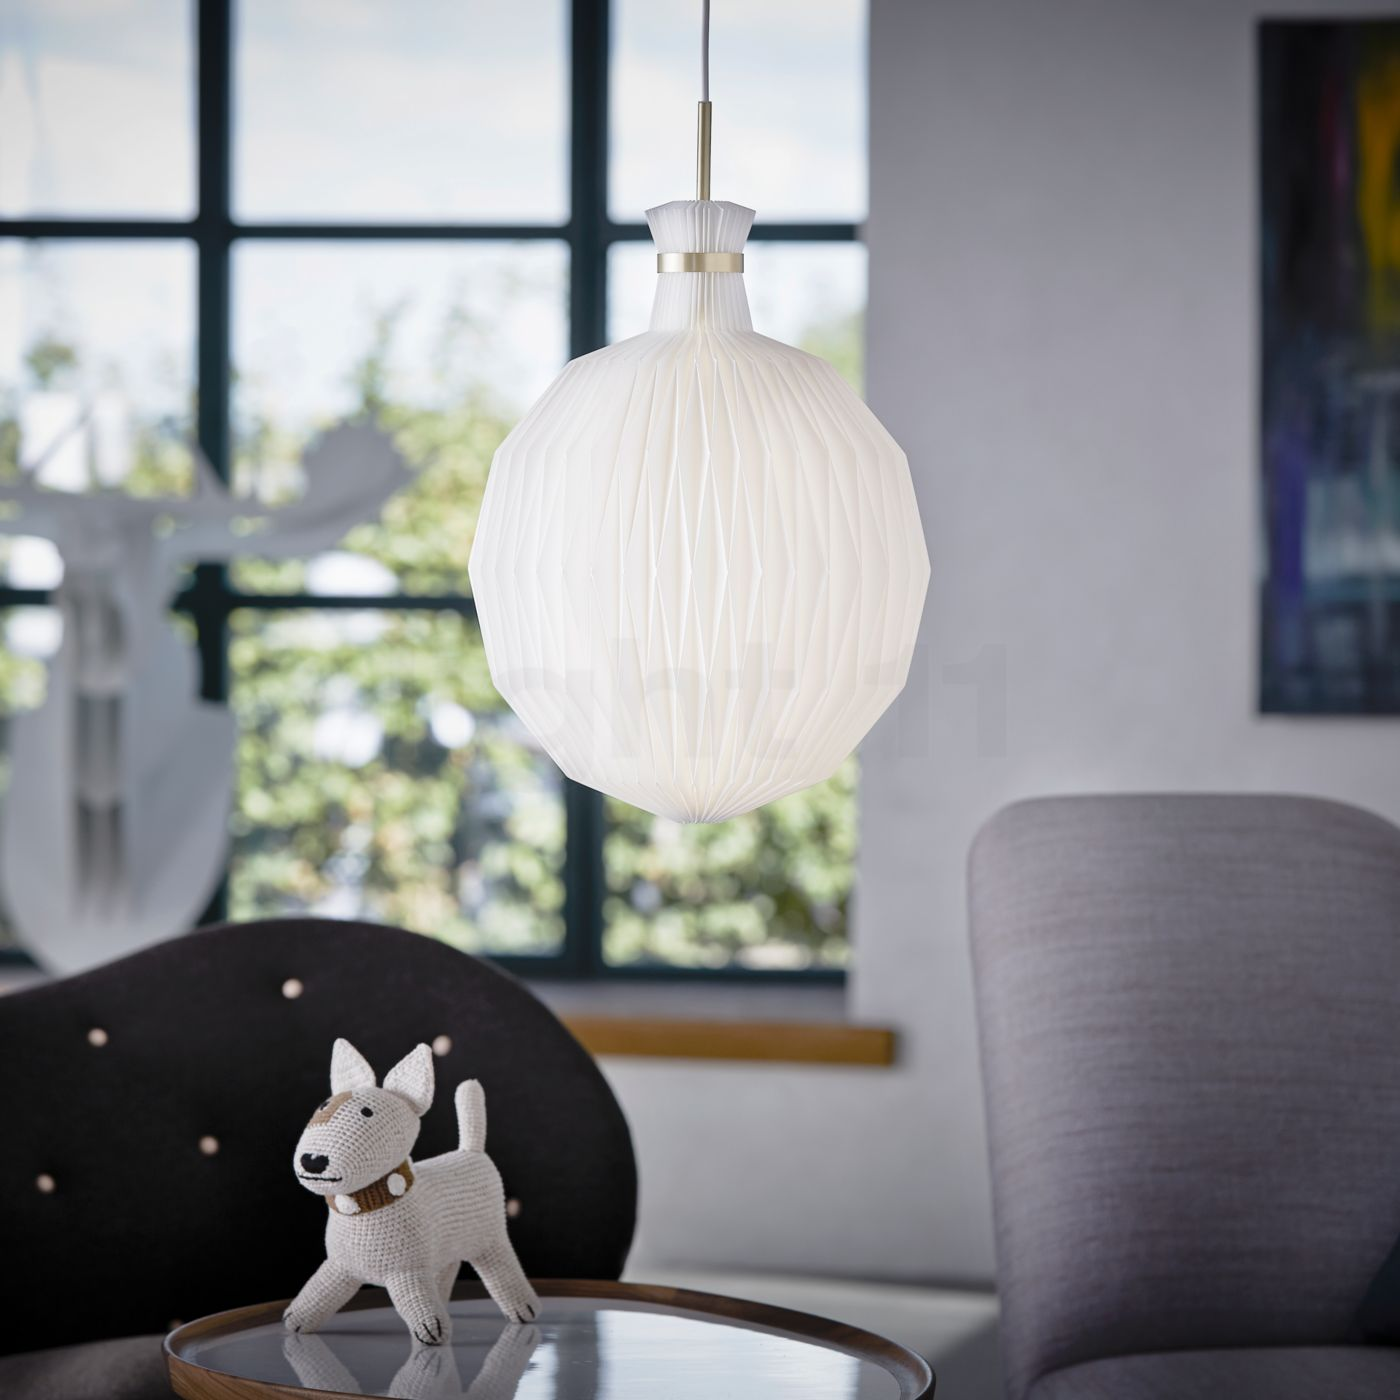 Le Klint 101 Pendant light Pendant lights buy at light11eu